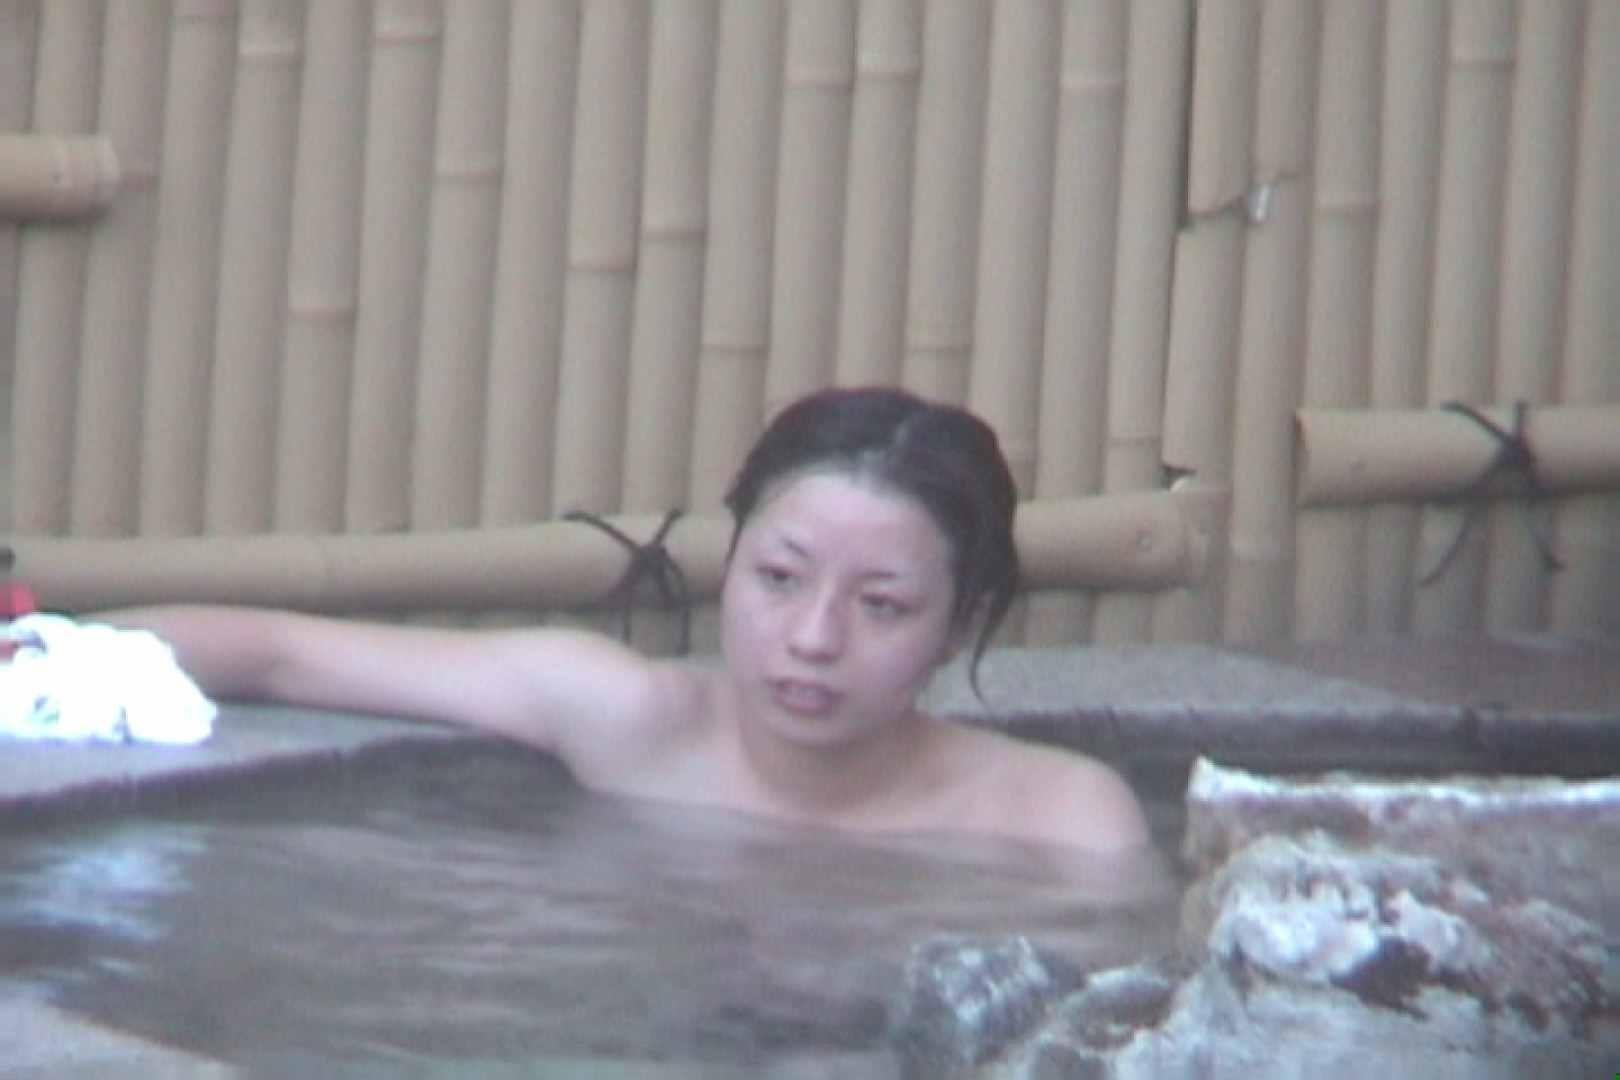 Aquaな露天風呂Vol.608 HなOL | 盗撮  89pic 41